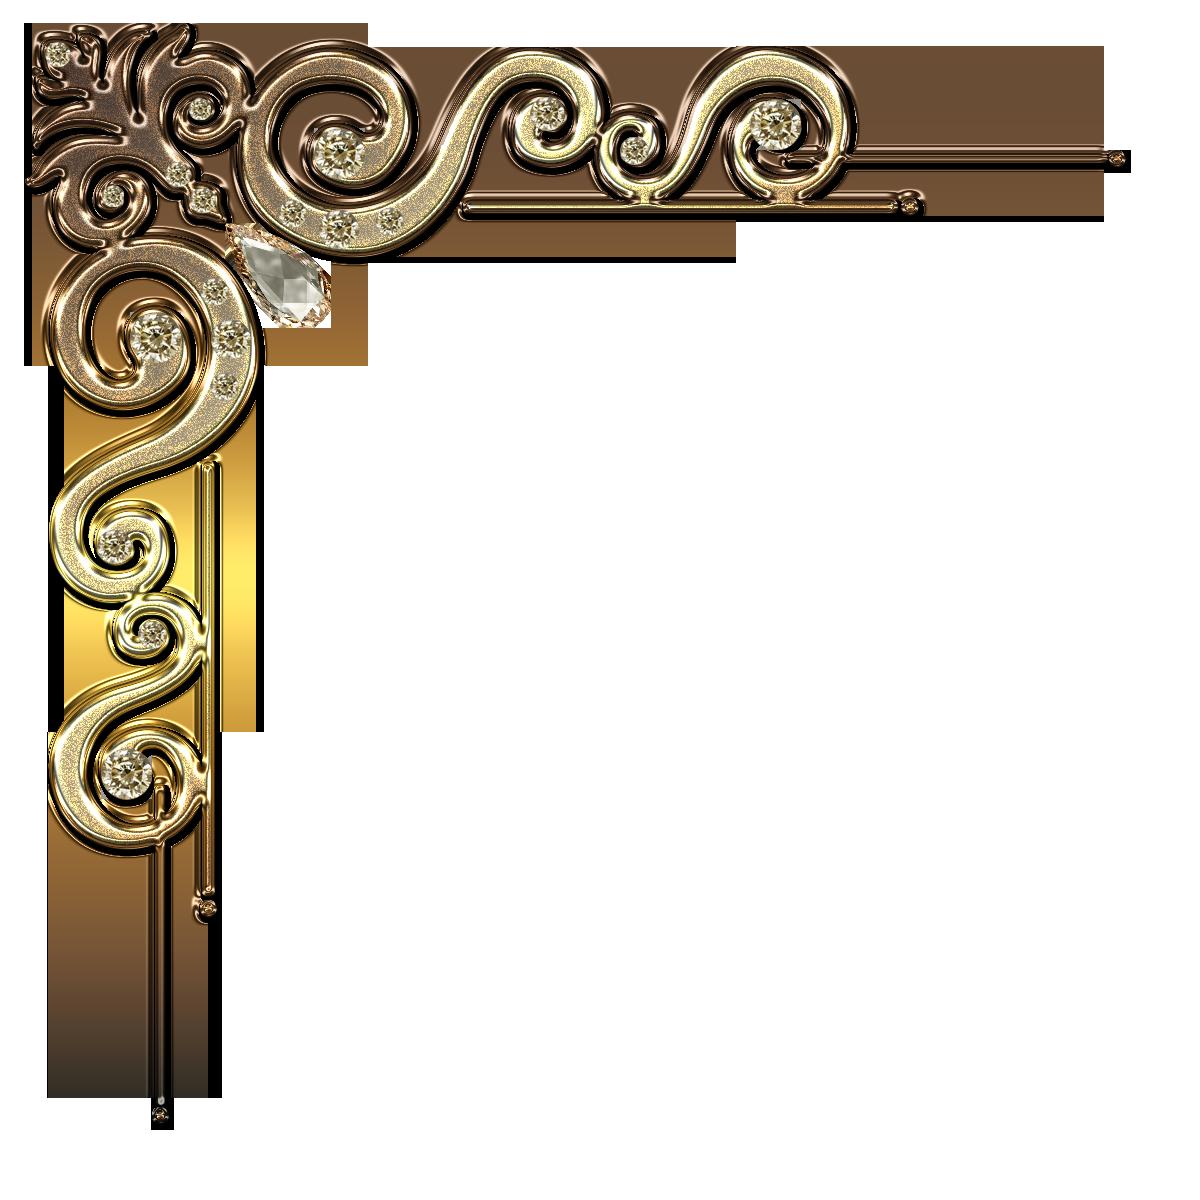 Free Scrapbook Craft Hobbies Hobby Embelishment Element Design Ornamental Decorative Divider B Gold Clipart Frame Border Design Clip Art Borders